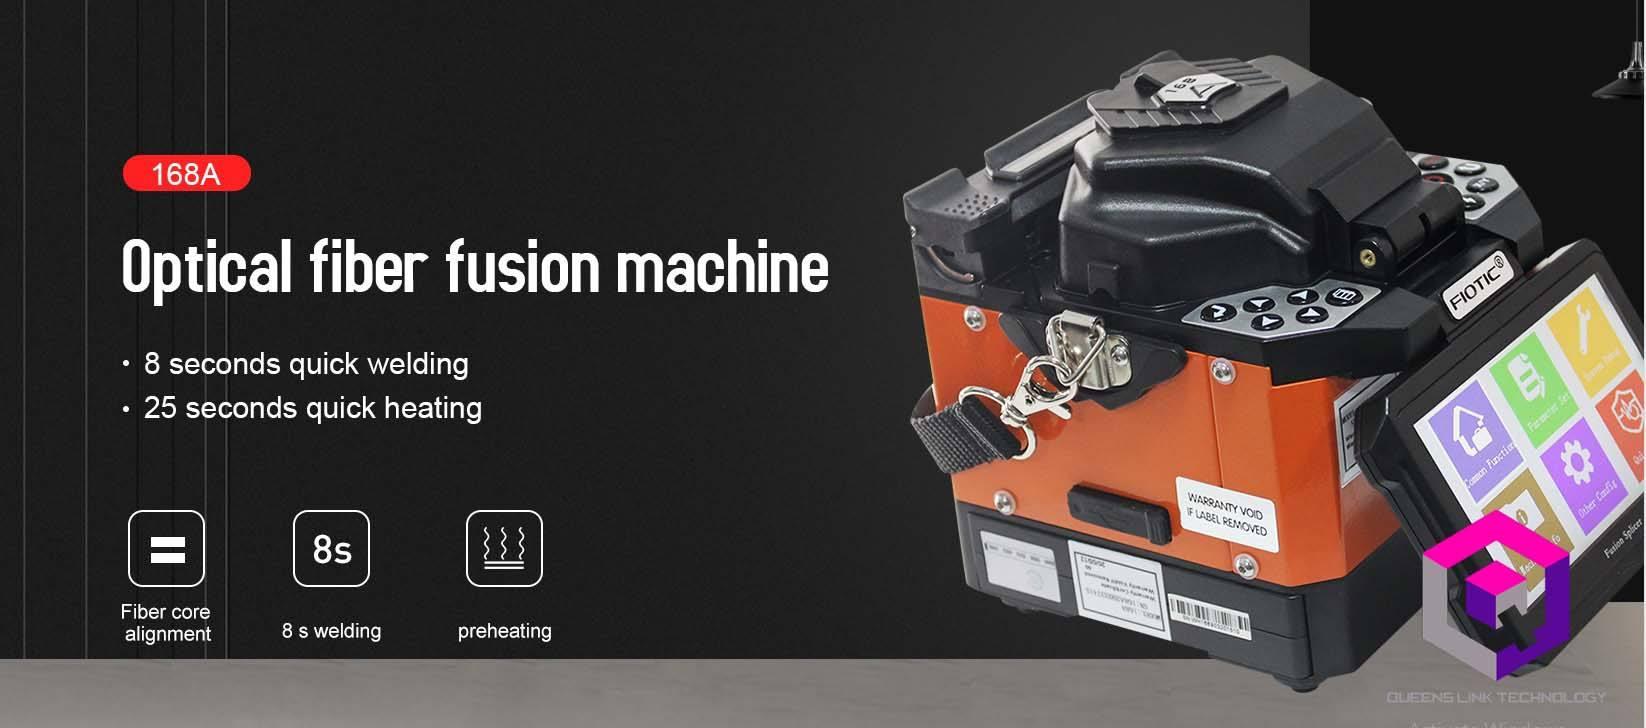 FUSION MACHINE